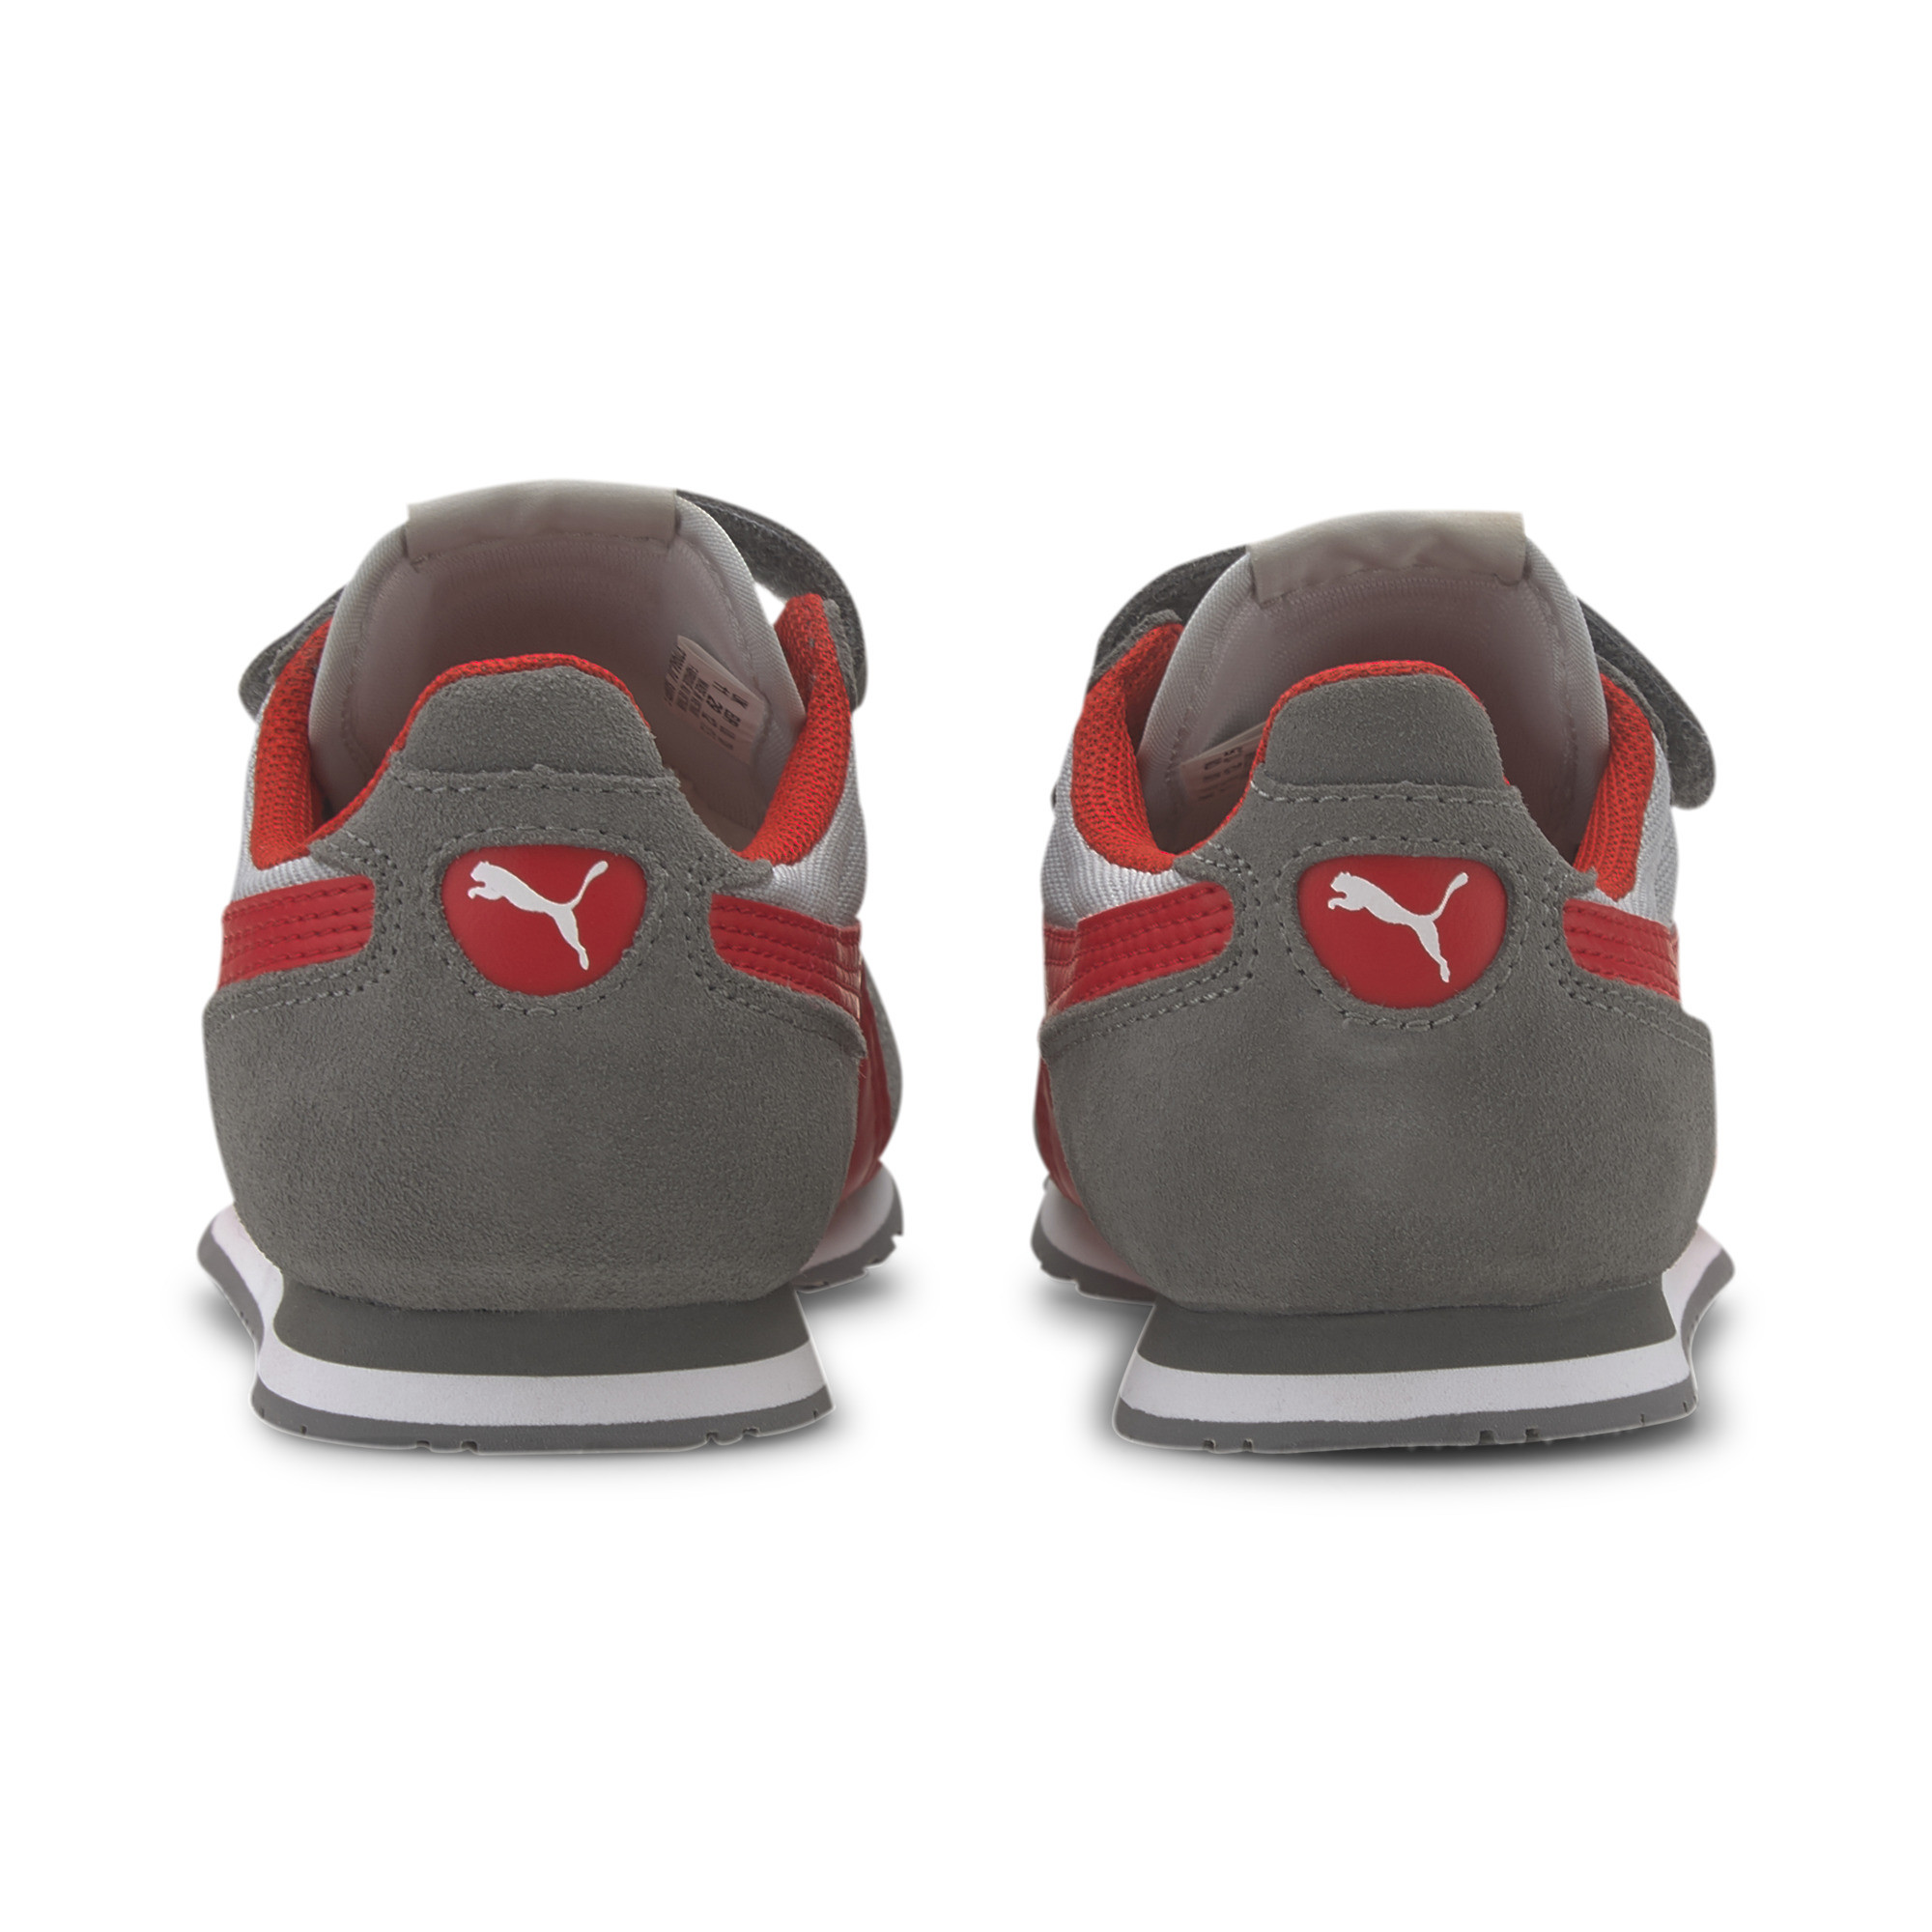 PUMA-Cabana-Racer-Little-Kids-039-Shoes-Kids-Shoe-Kids thumbnail 26